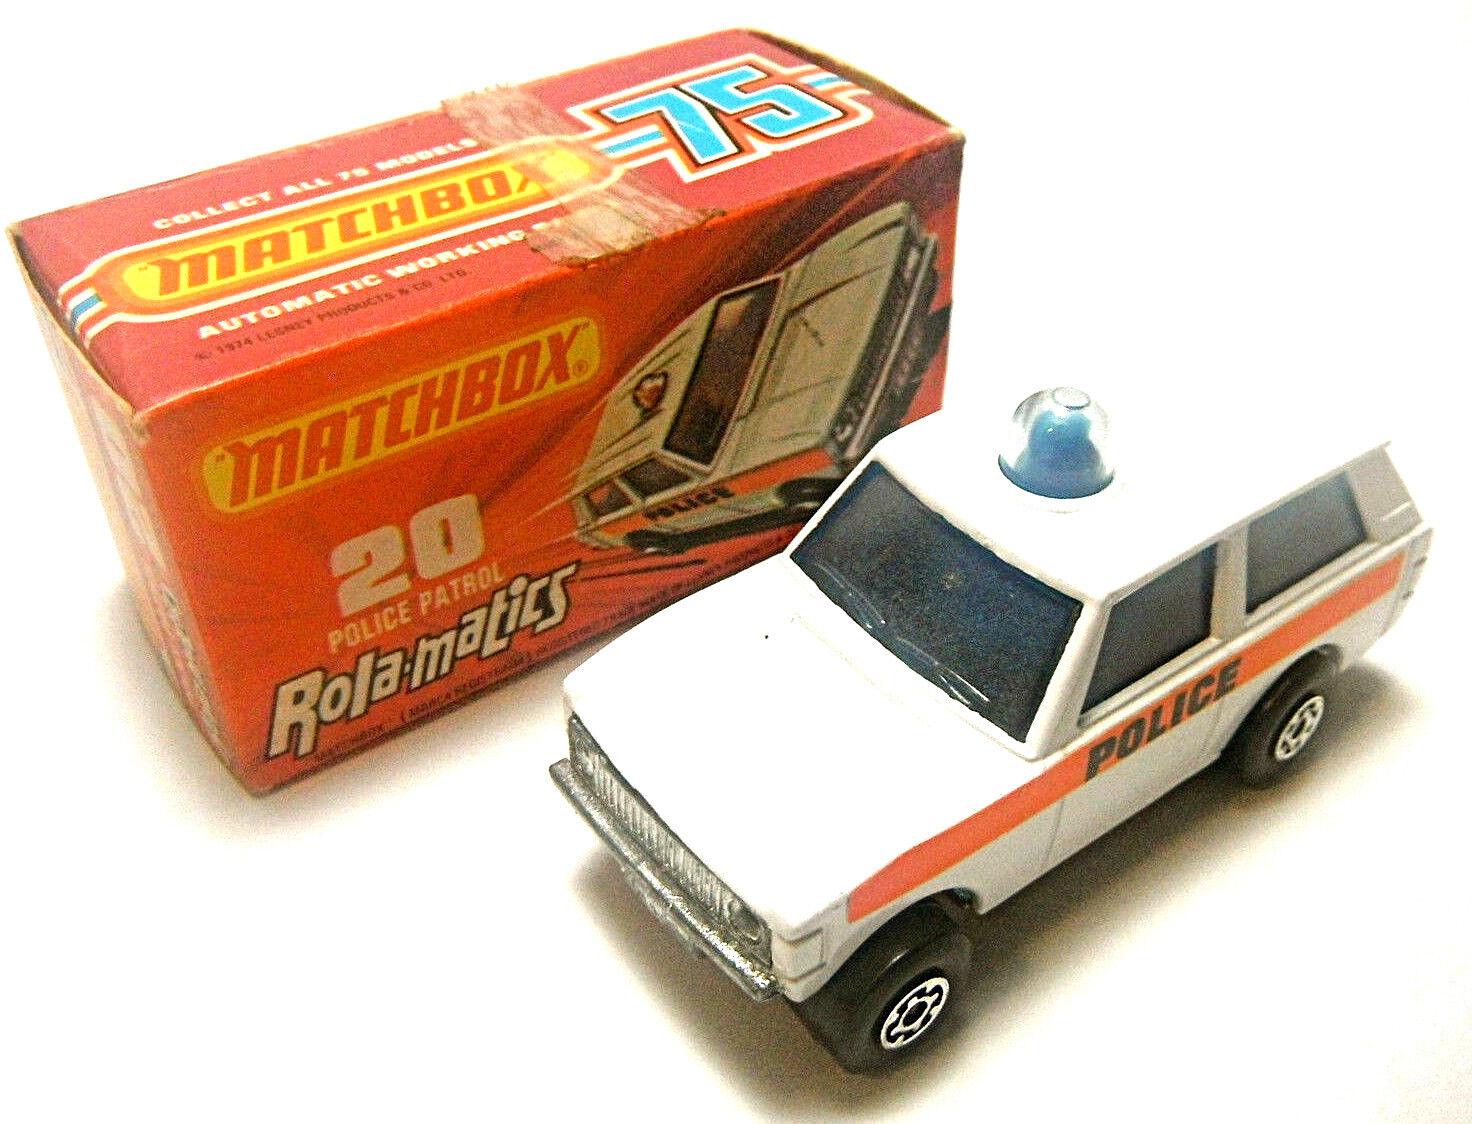 1975 Matchbox Lesney Rola-matics Police Patrol  MPN 20 Solid bluee Spinner NIB